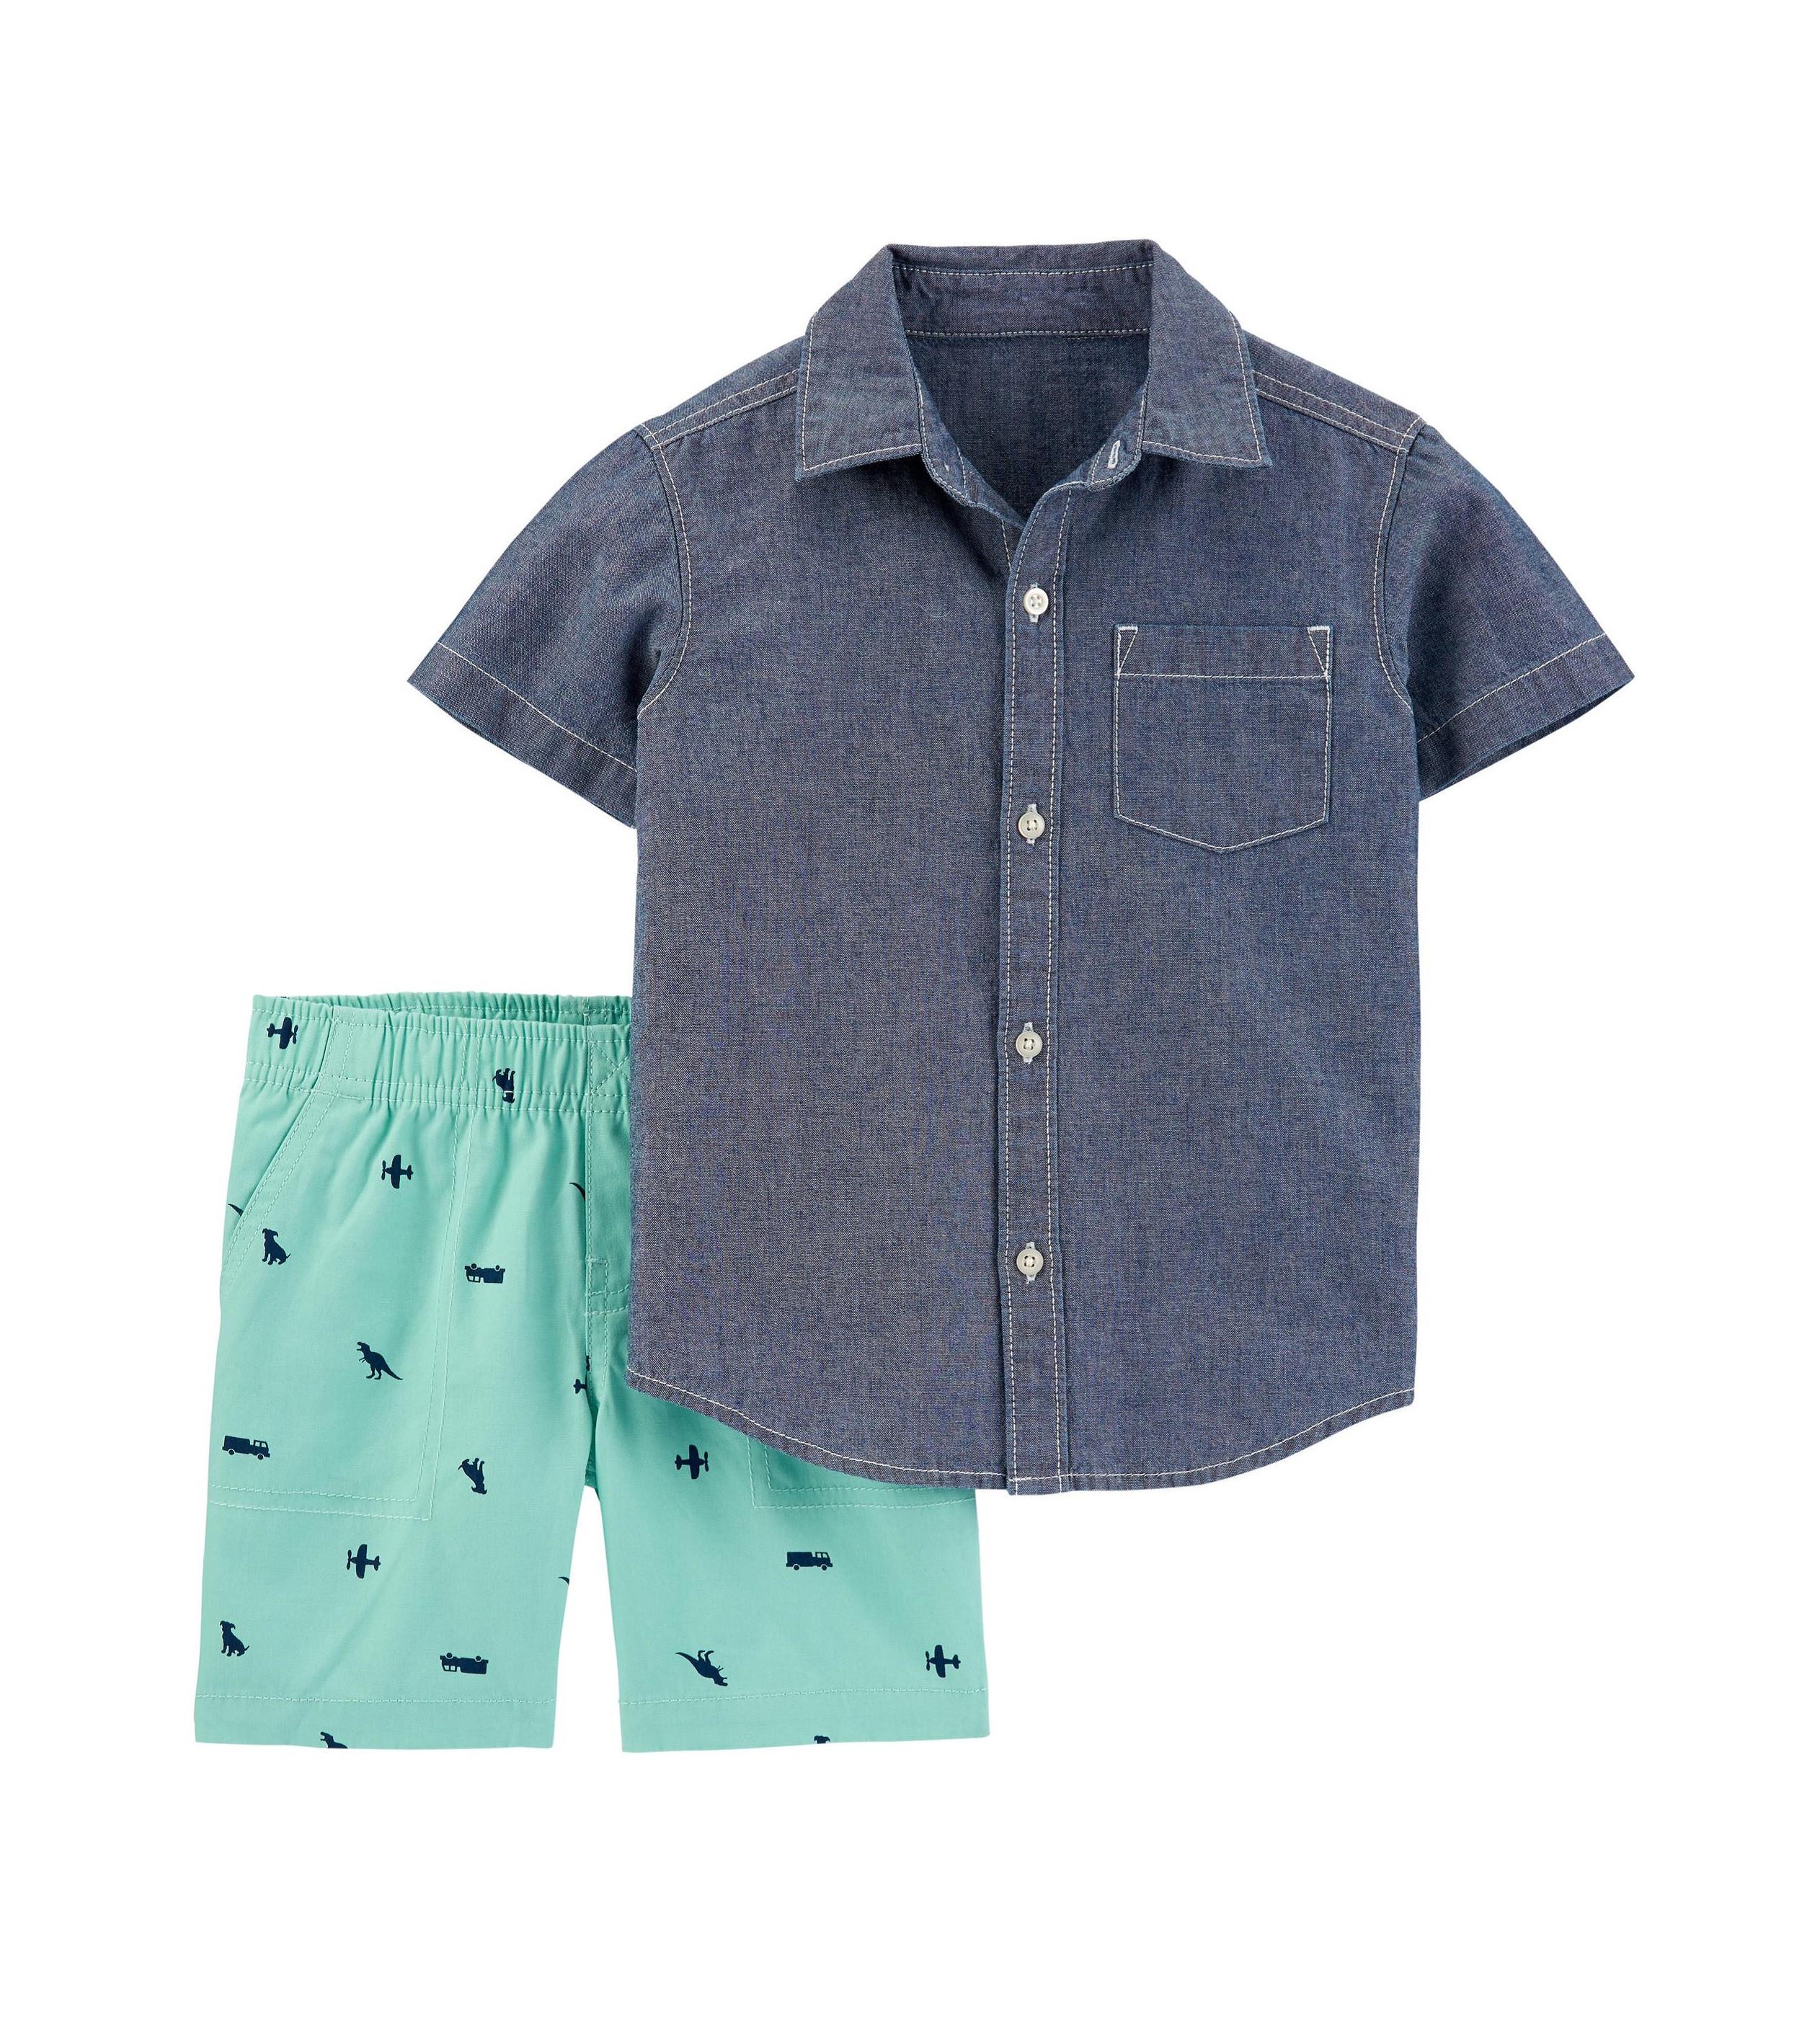 Купити Набір Carters Chambray Blue/Turquoise - фото 1